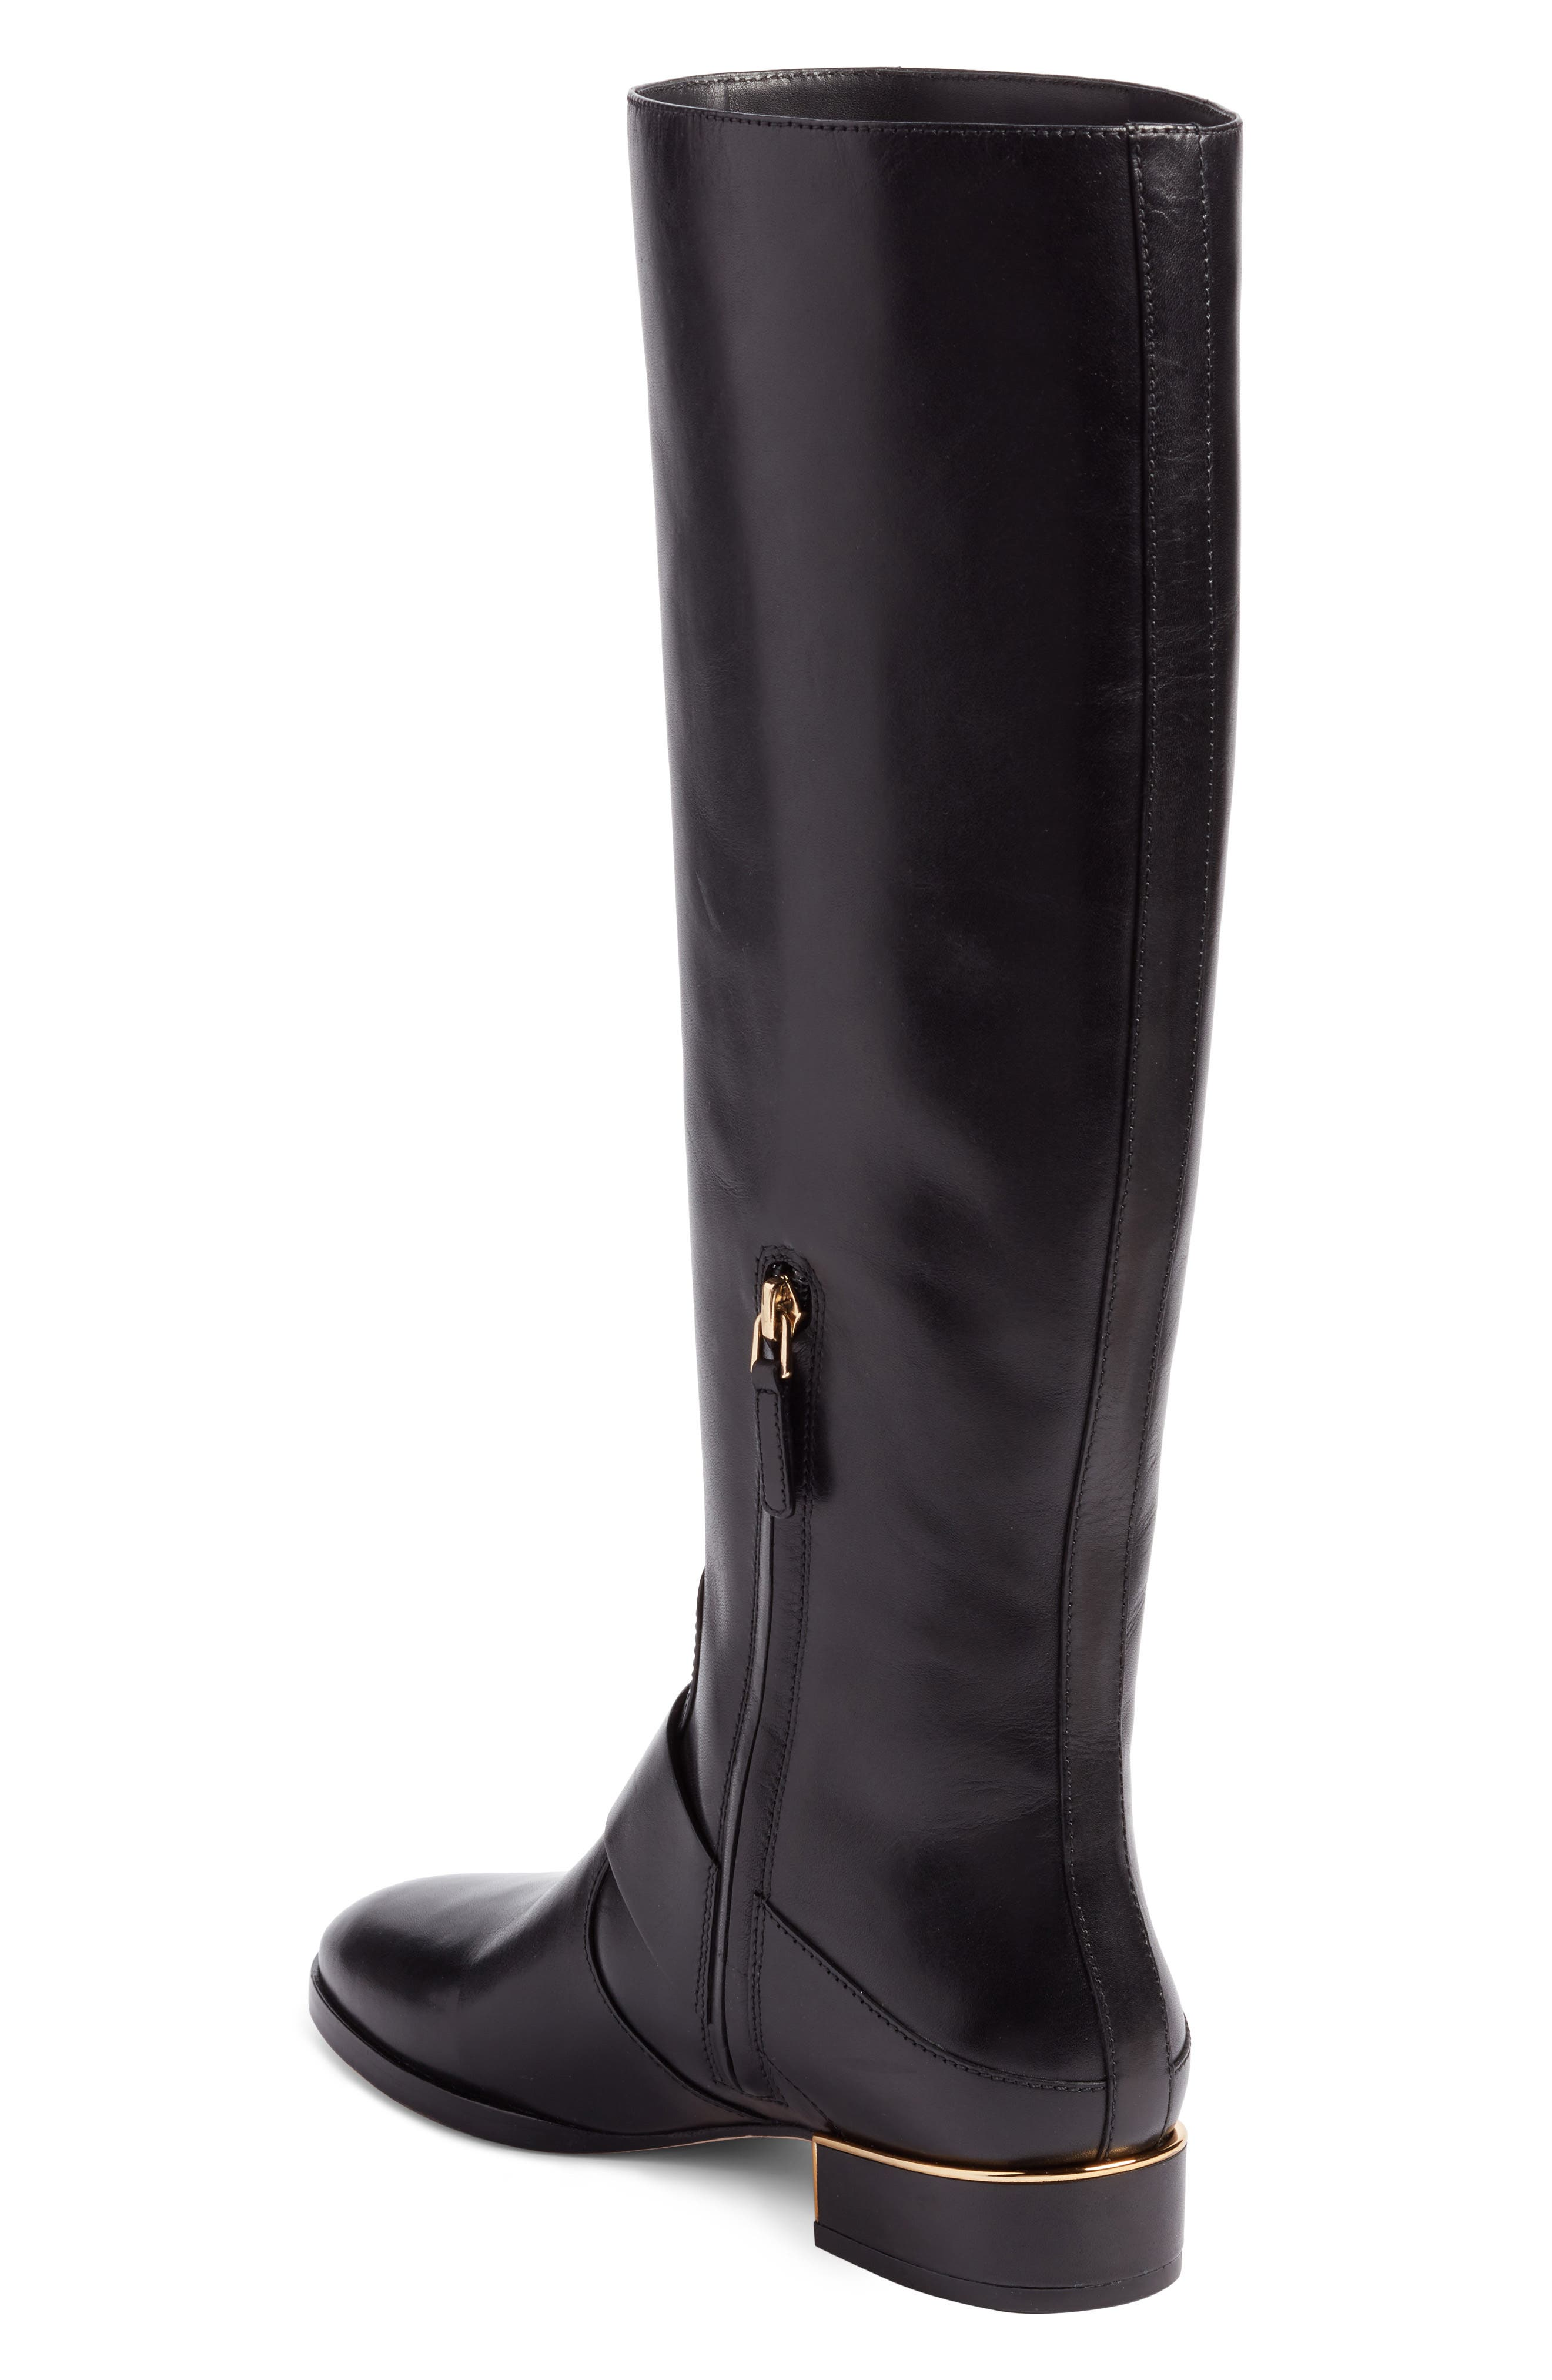 Alternate Image 2  - Tory Burch Sofia Buckled Riding Boot (Women) (Regular & Wide Calf)